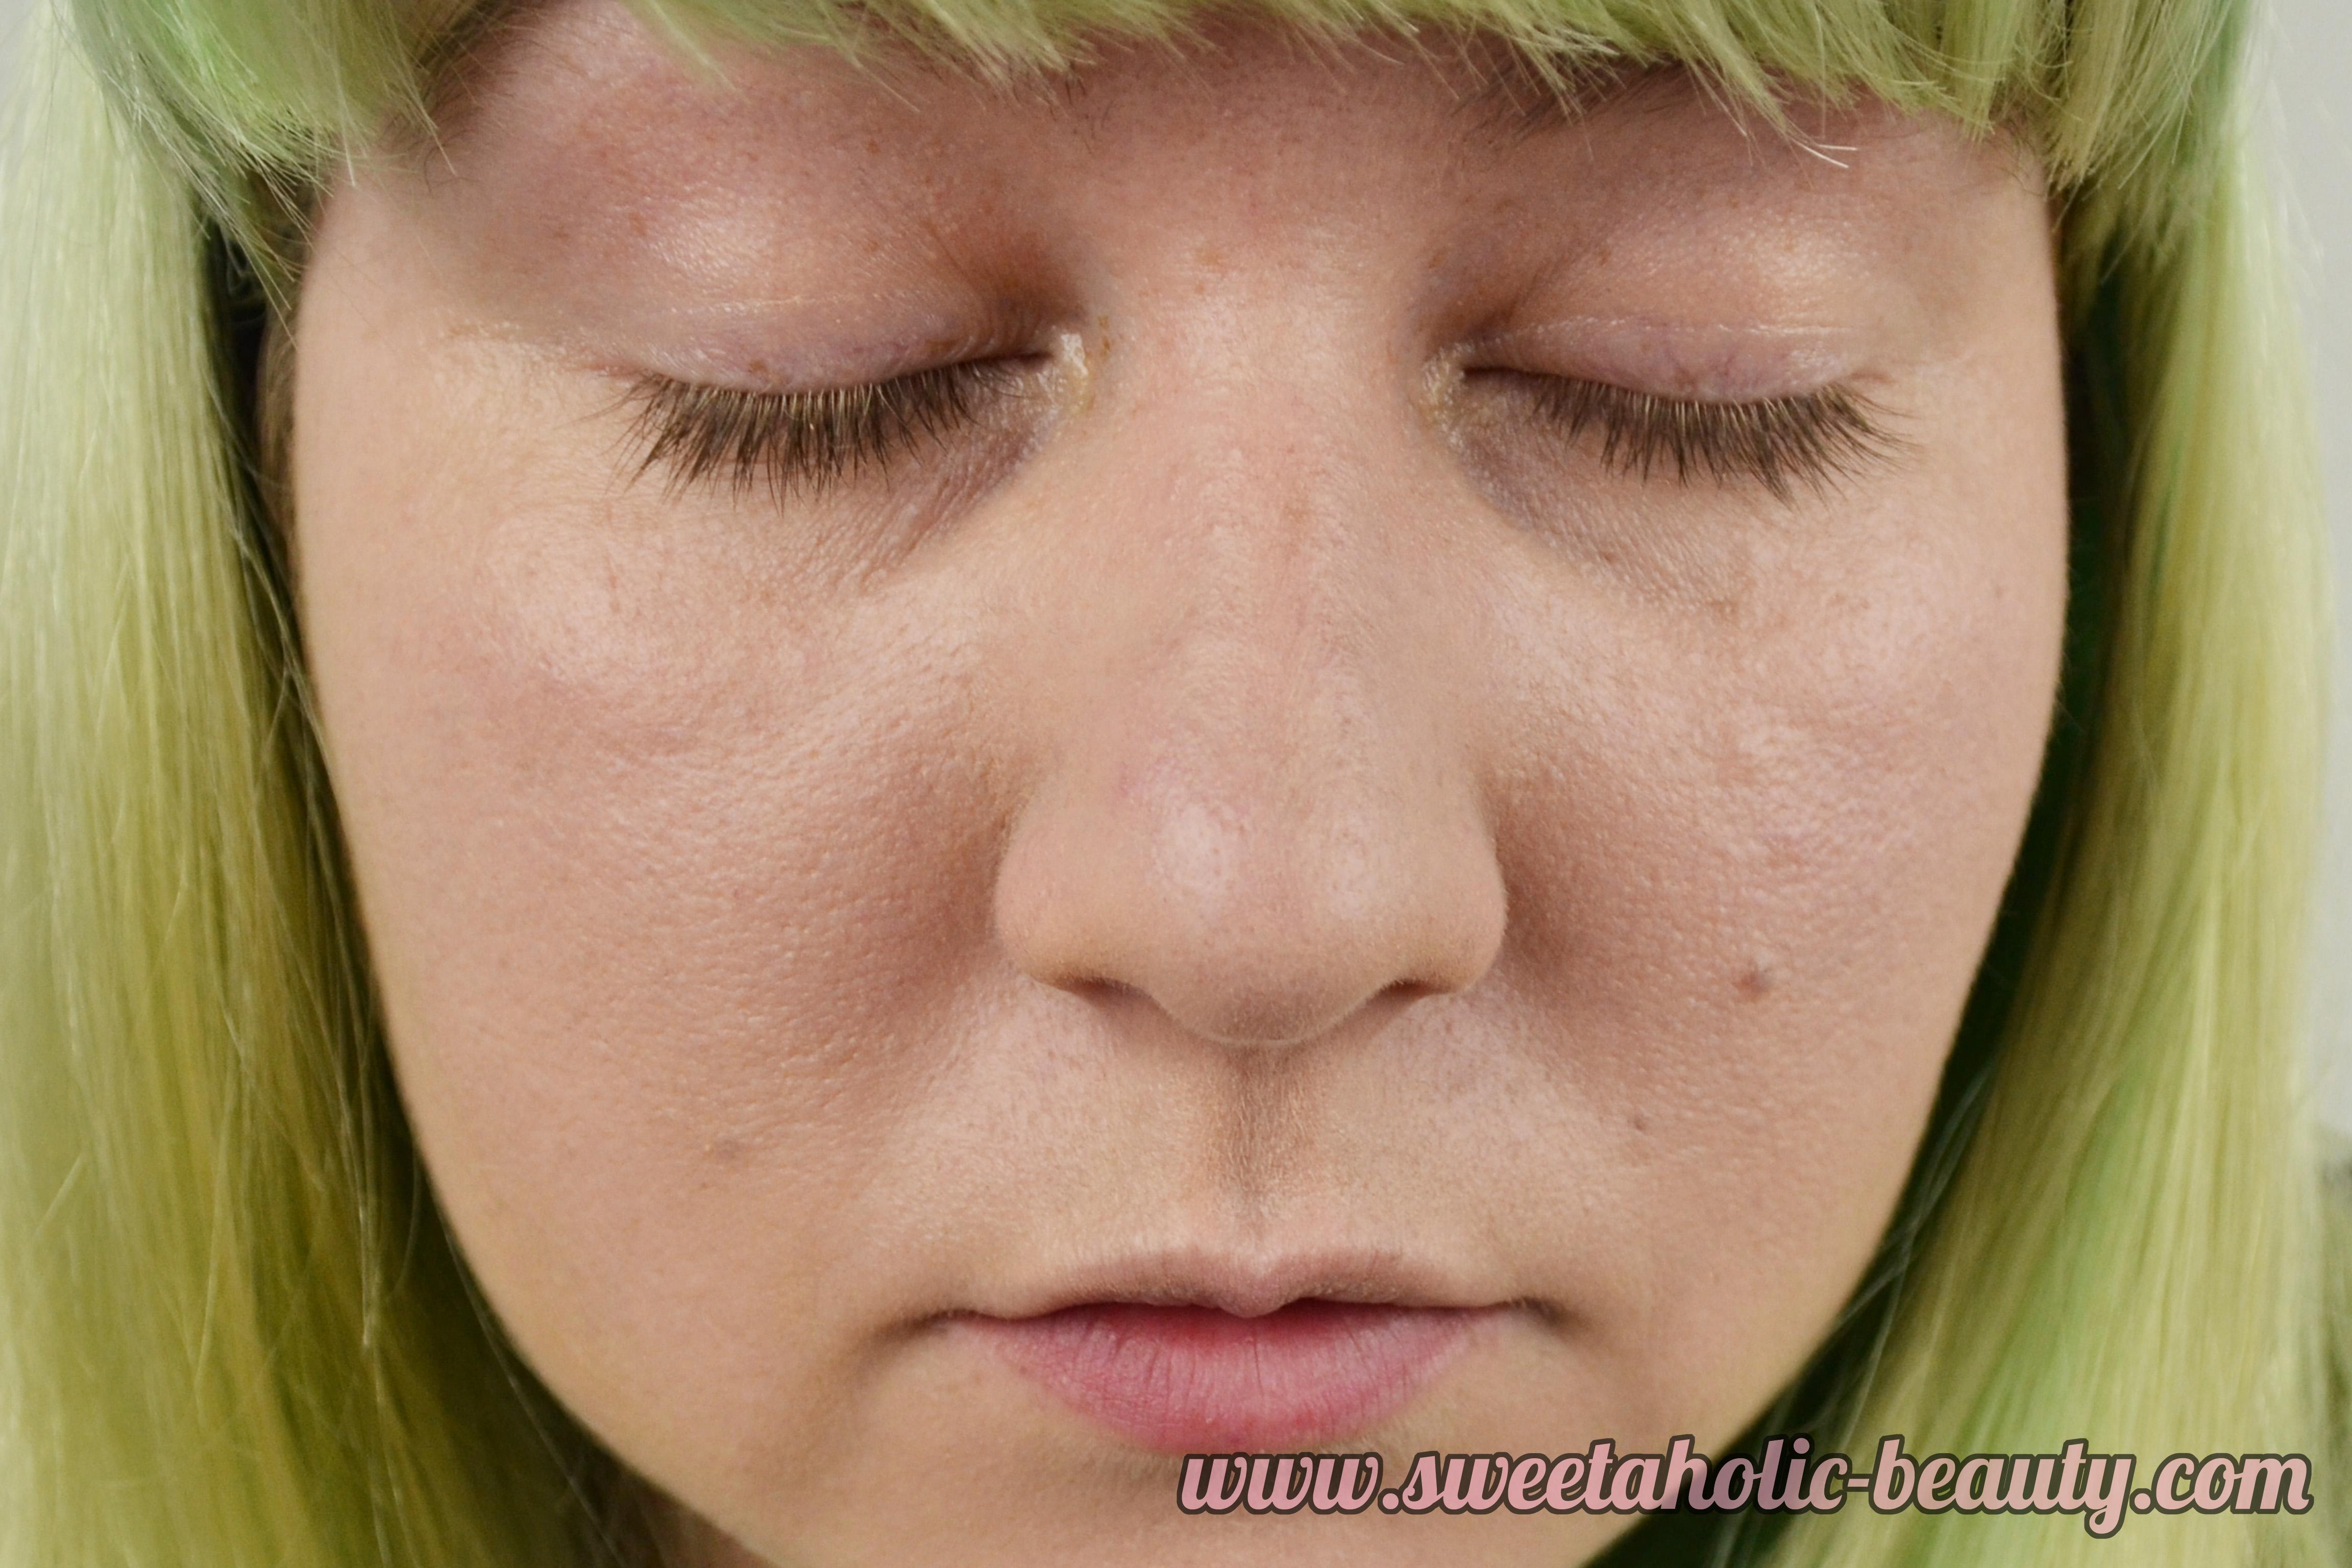 Rimmel London Match Perfection Foundation Comparison - Sweetaholic Beauty